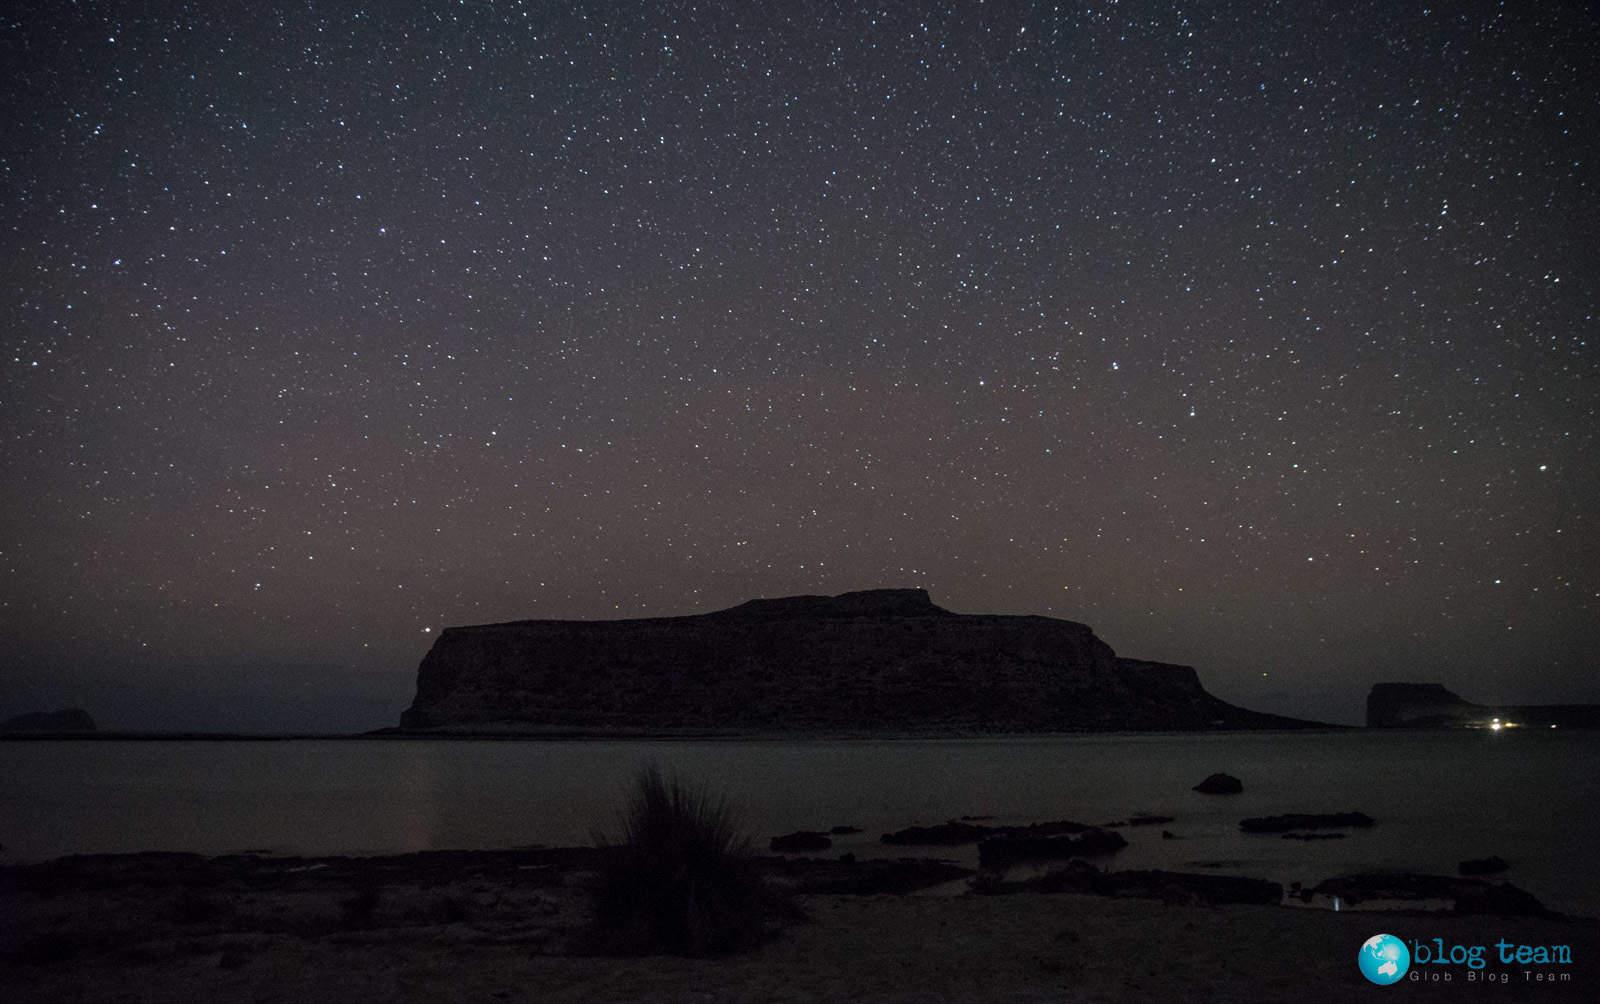 Cap Tigani - Balos na Krecie - Cap Tigani Balos Beach, Crete